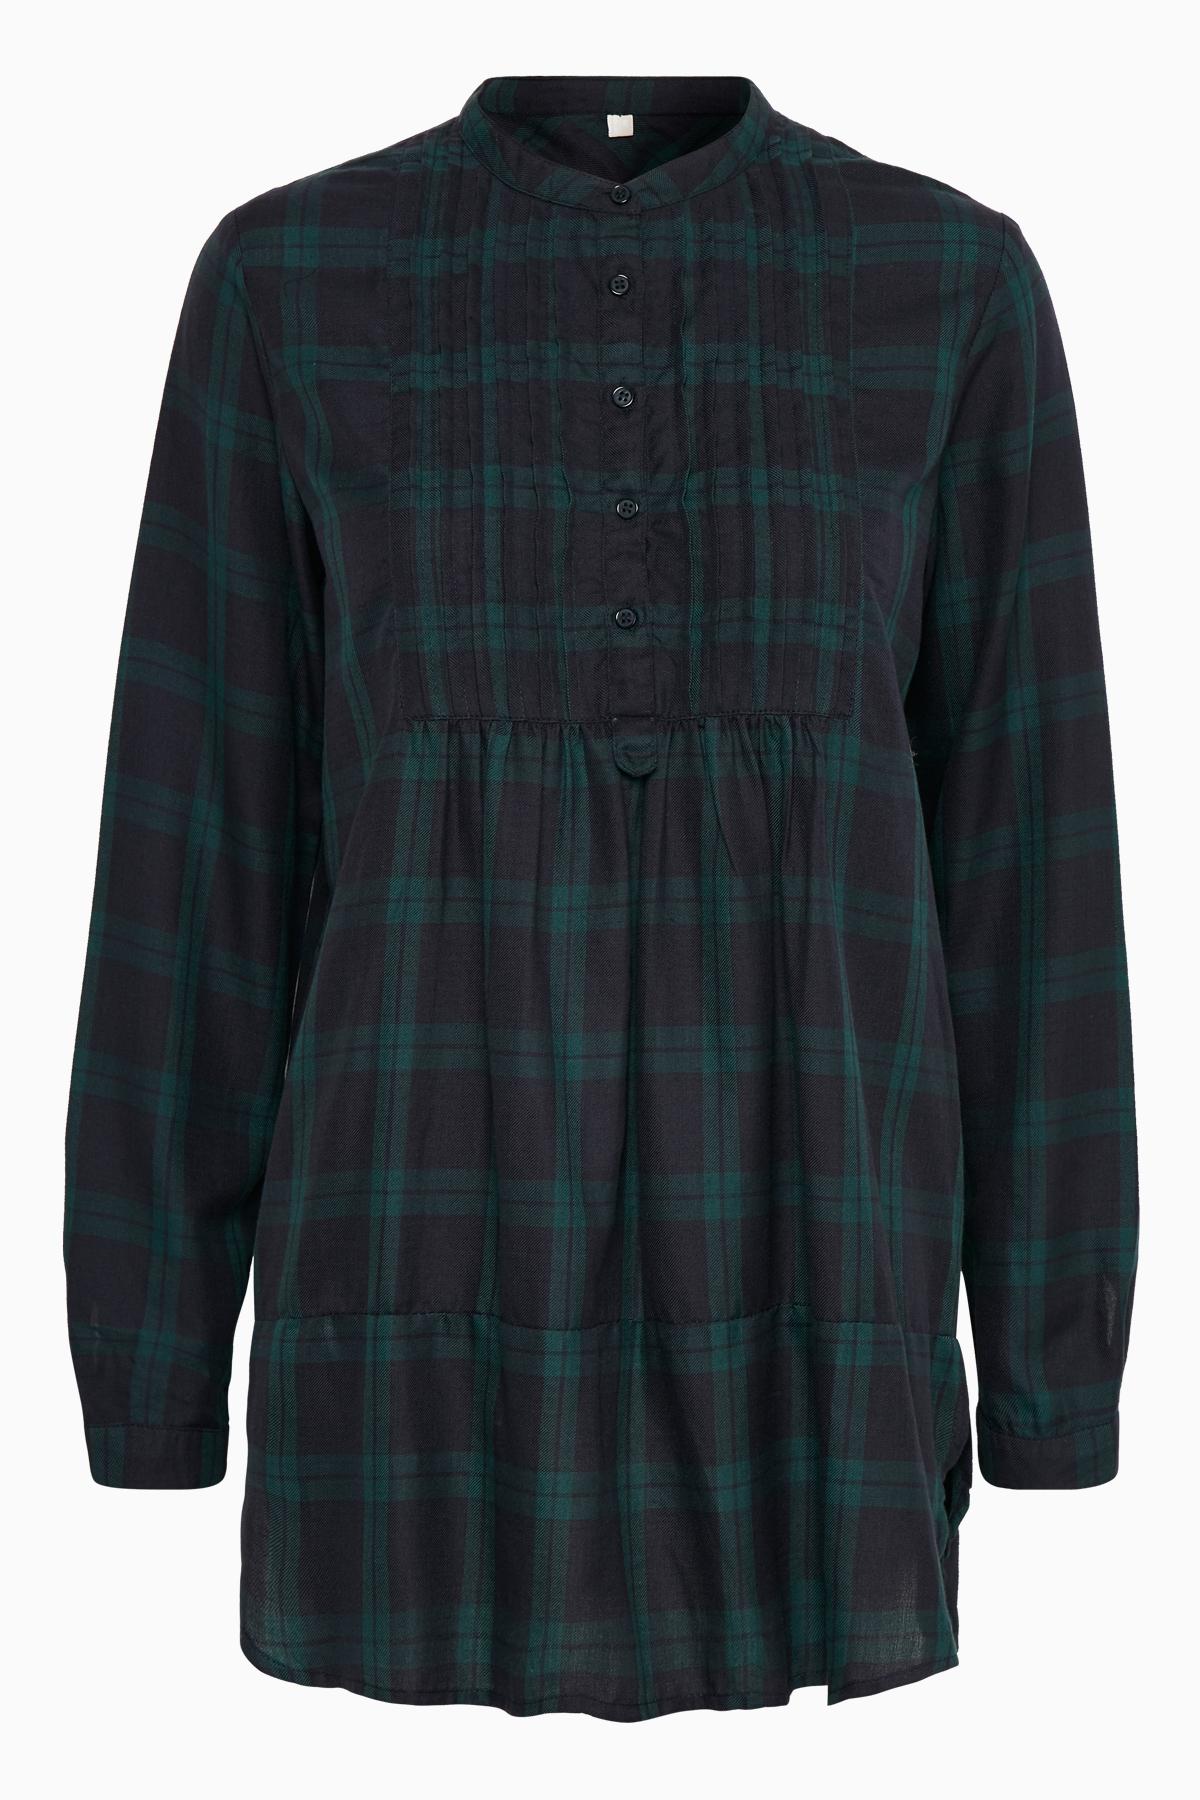 Marineblau Langarm-Bluse von Bon'A Parte – Shoppen Sie Marineblau Langarm-Bluse ab Gr. S-3XL hier